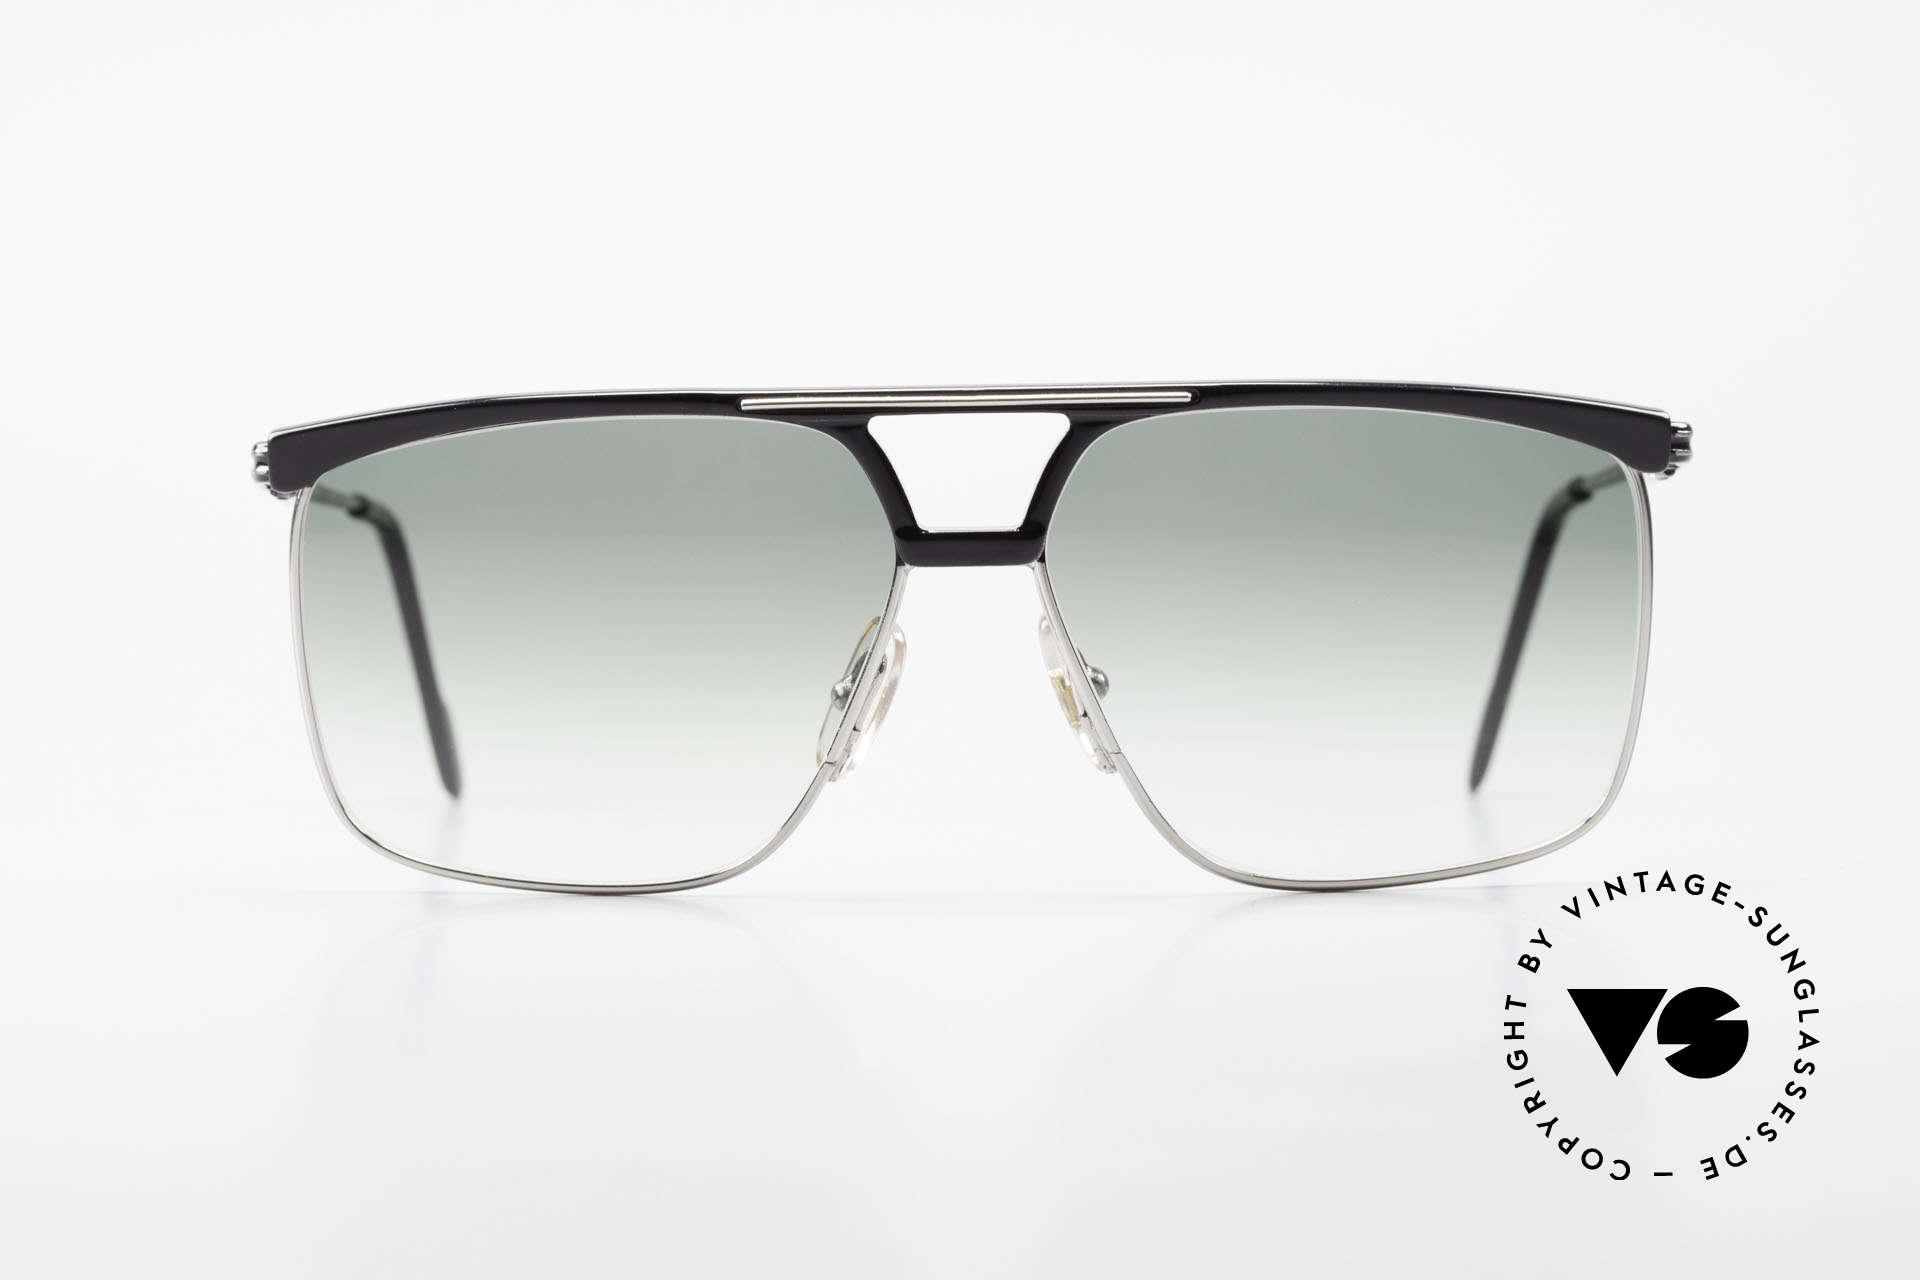 Ferrari F35 Alutanium Sunglasses Large, finest quality & superior frame finishing; true vintage, Made for Men